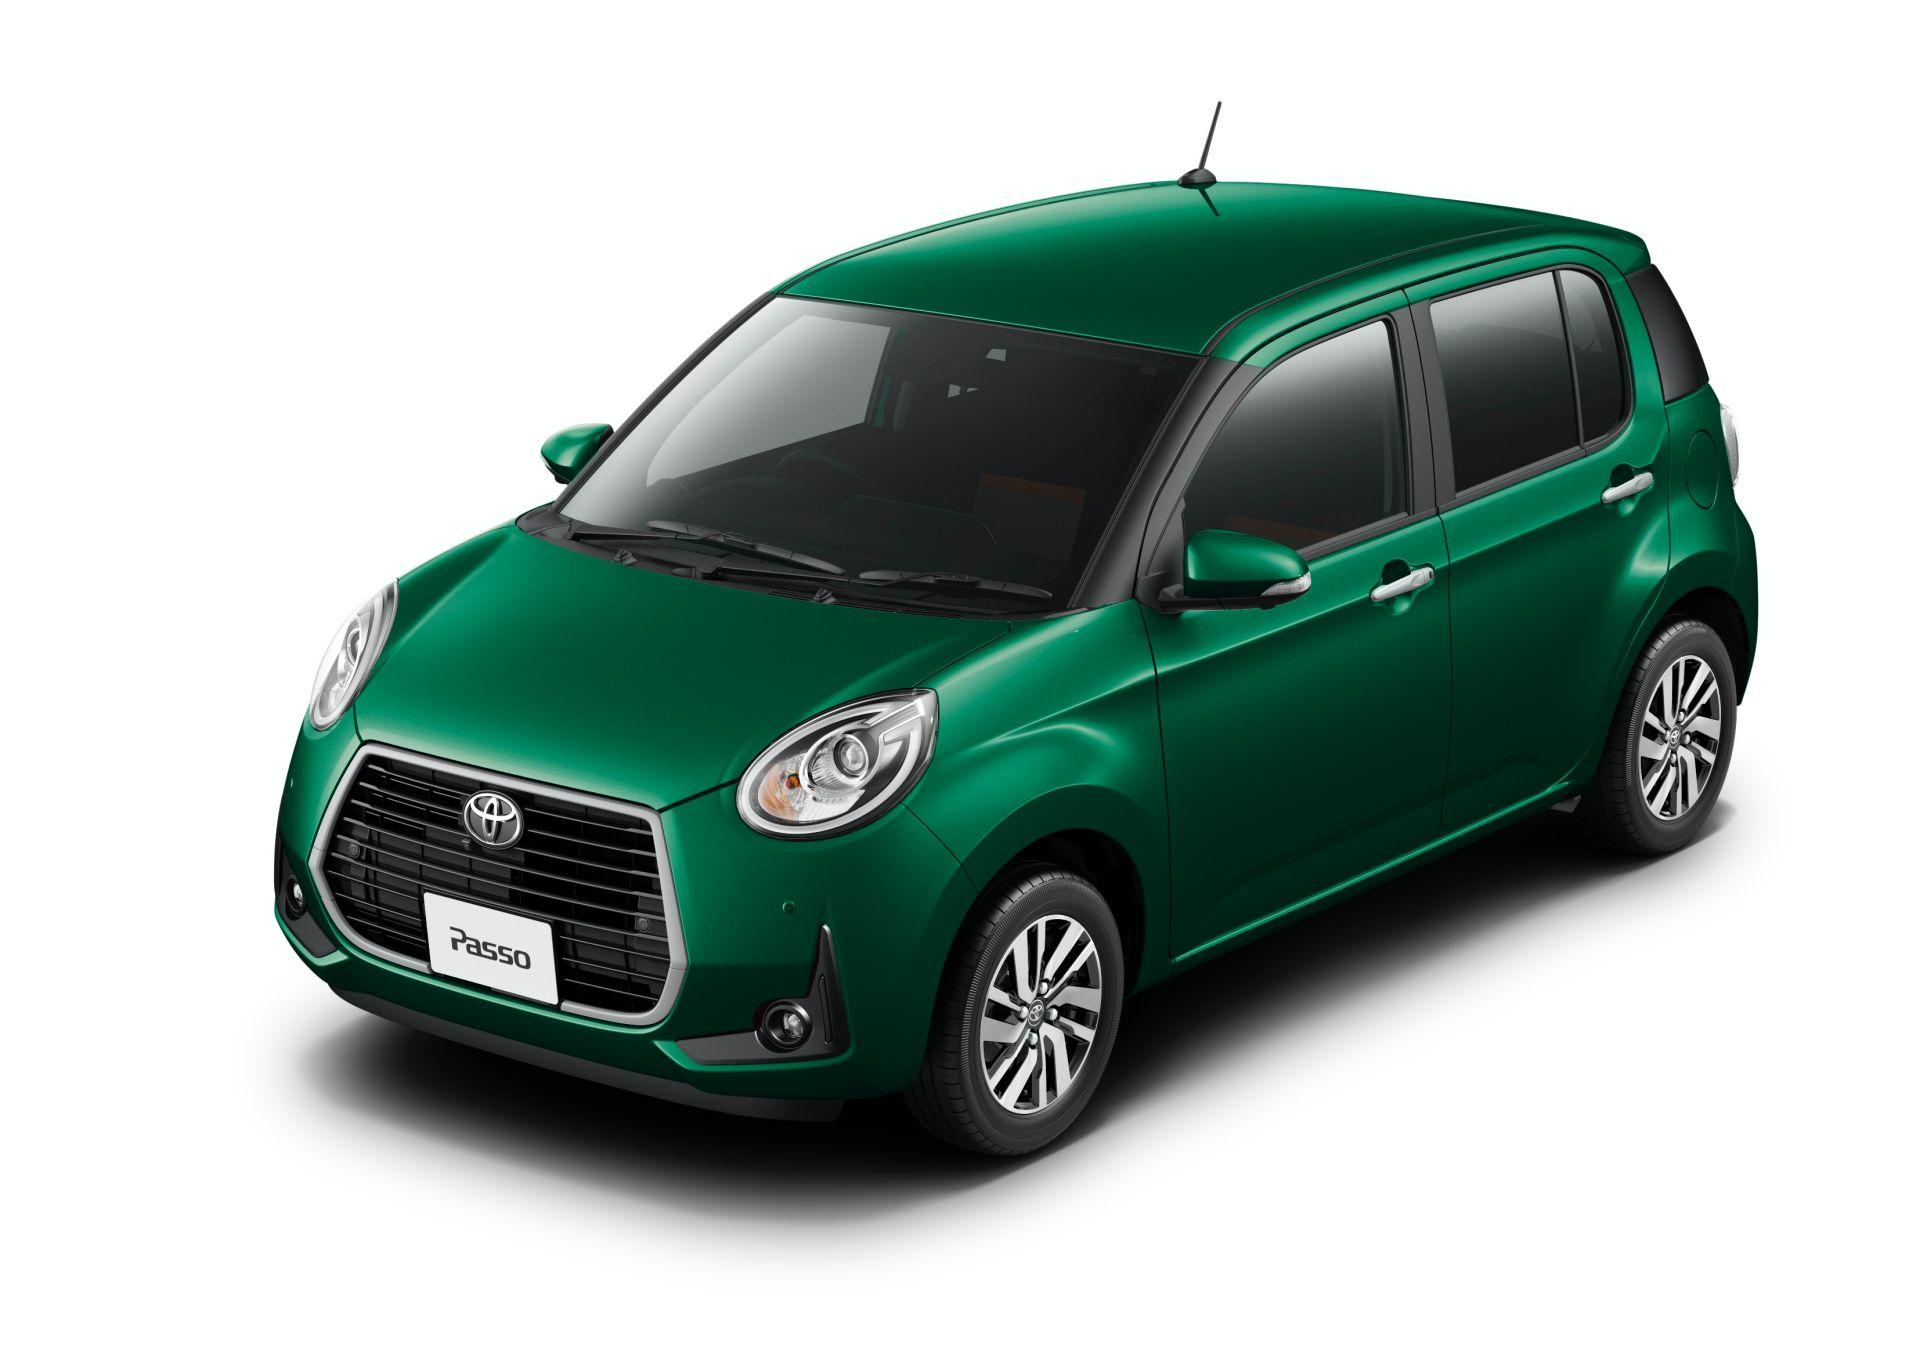 Toyota_Passo_Moda_Charm_0004